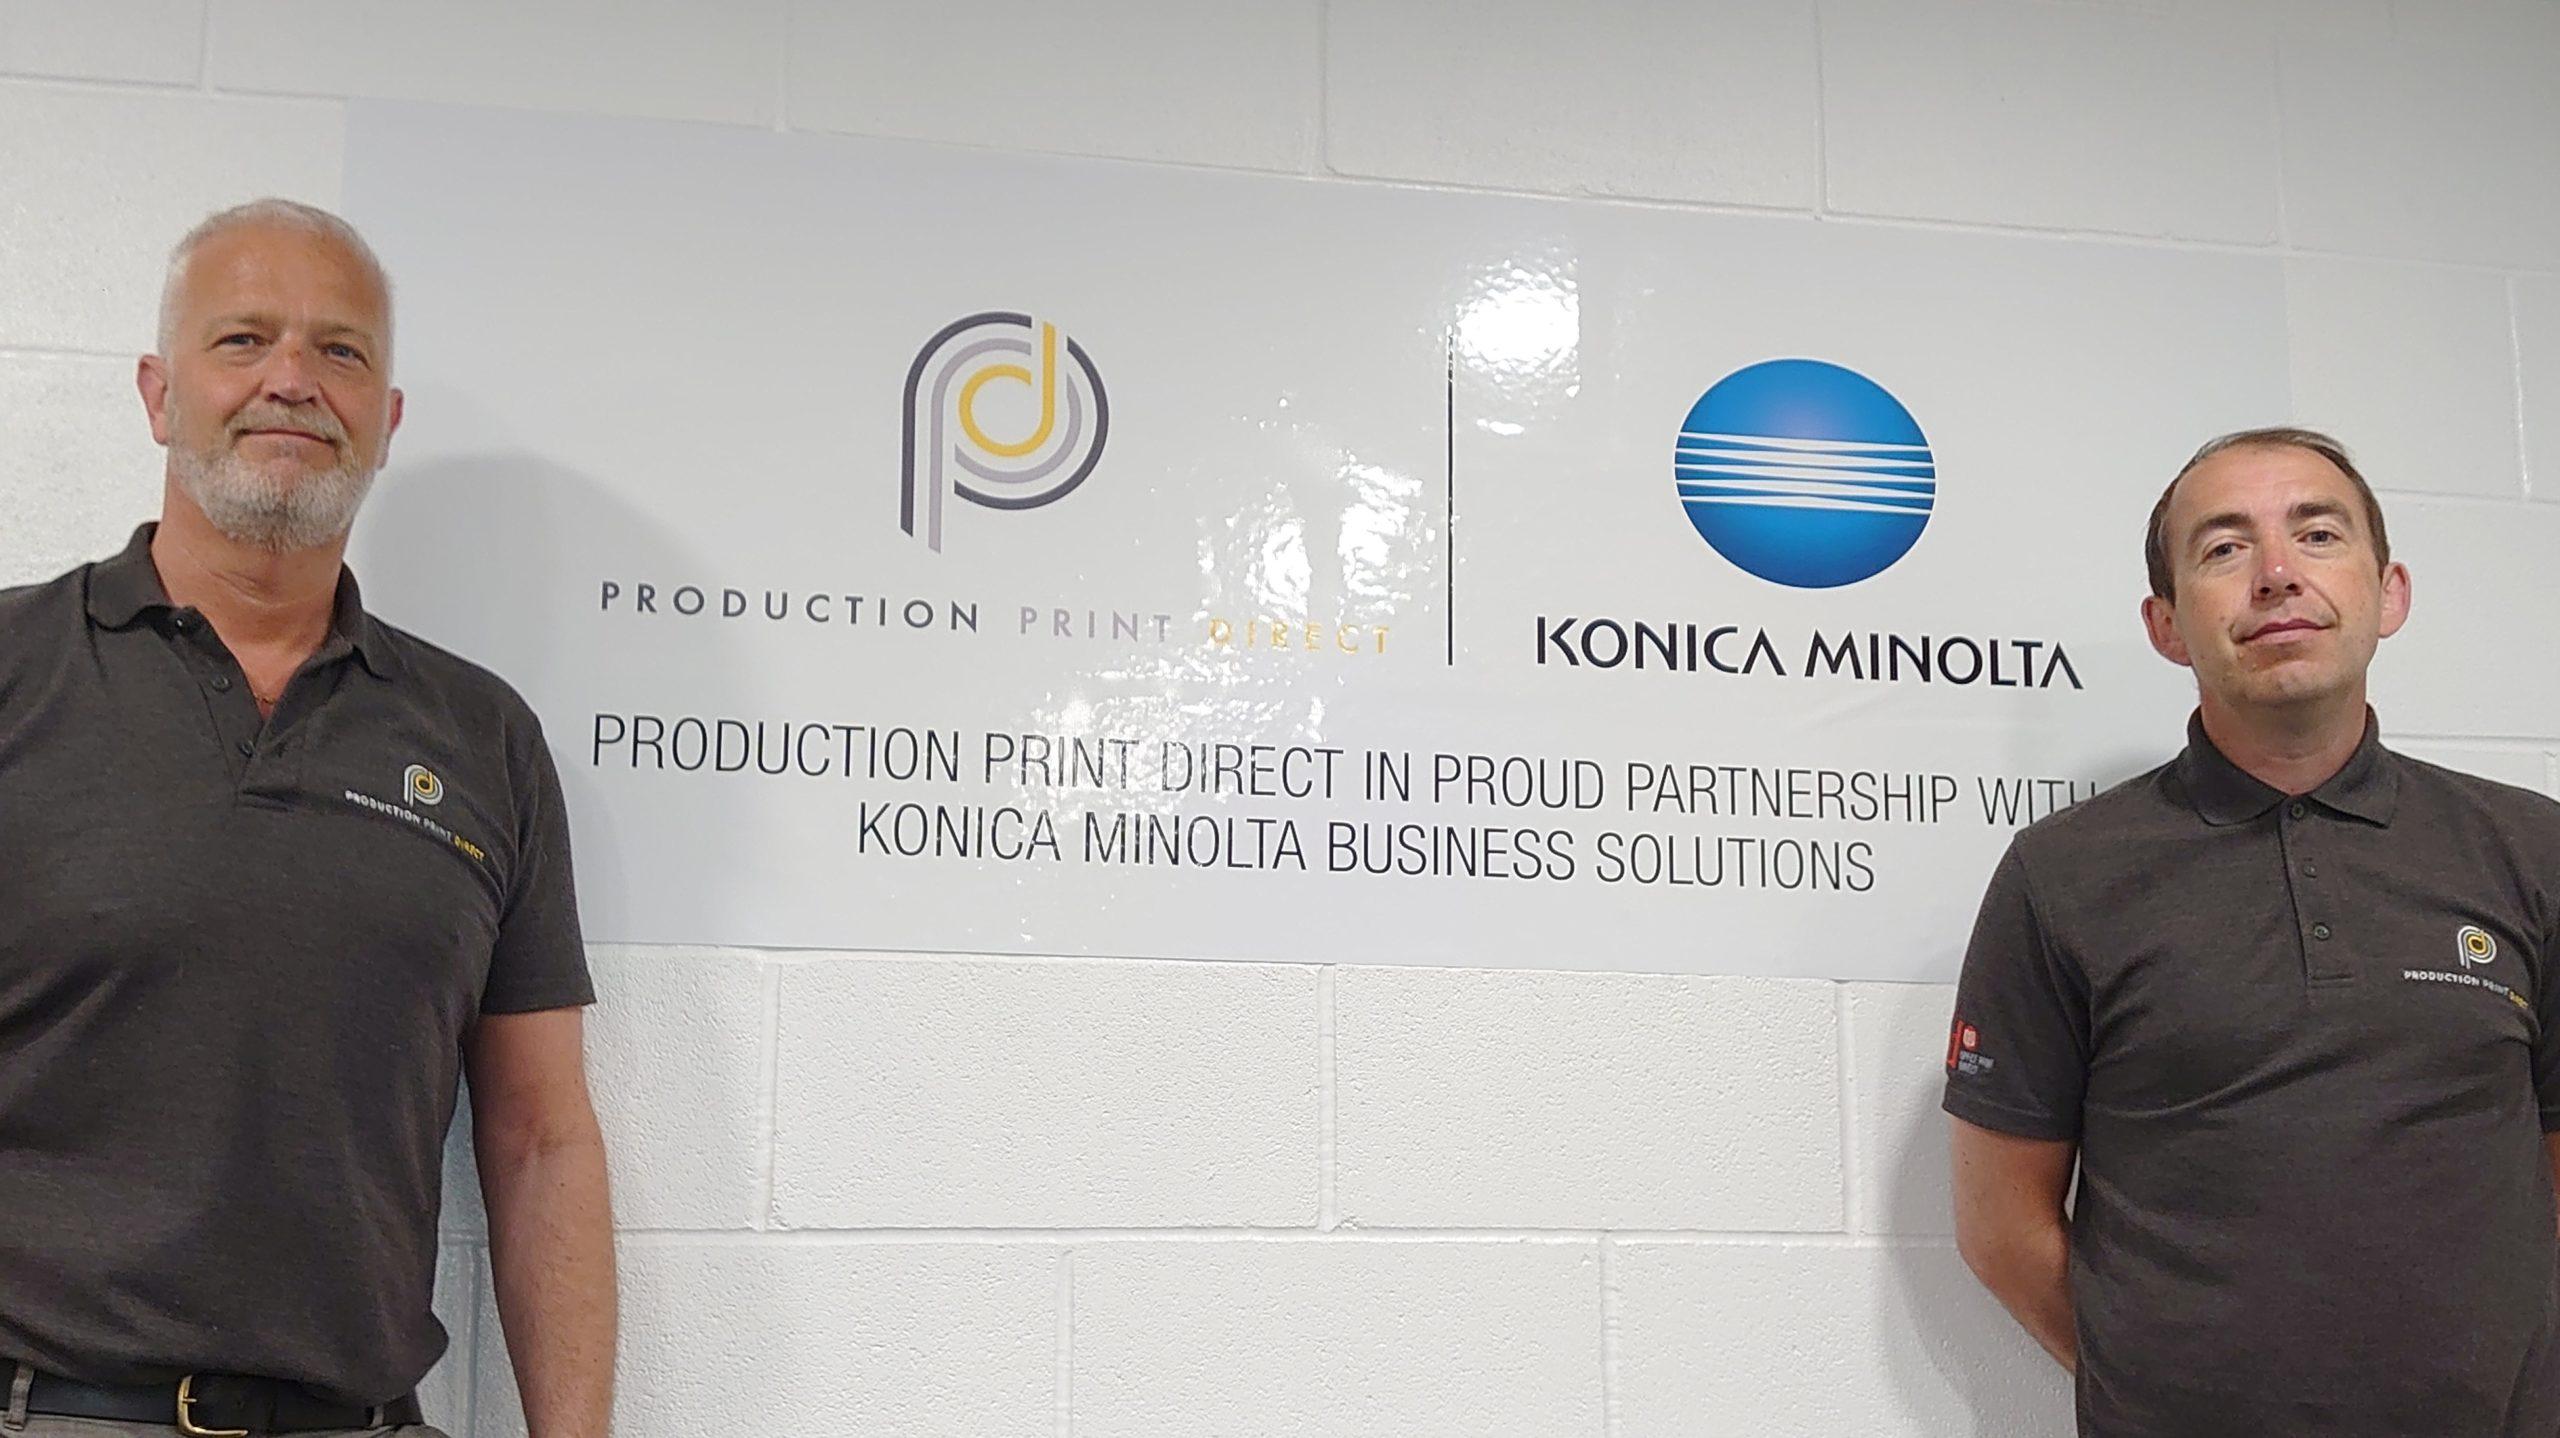 Production Print Direct and Konica Minolta Partnership